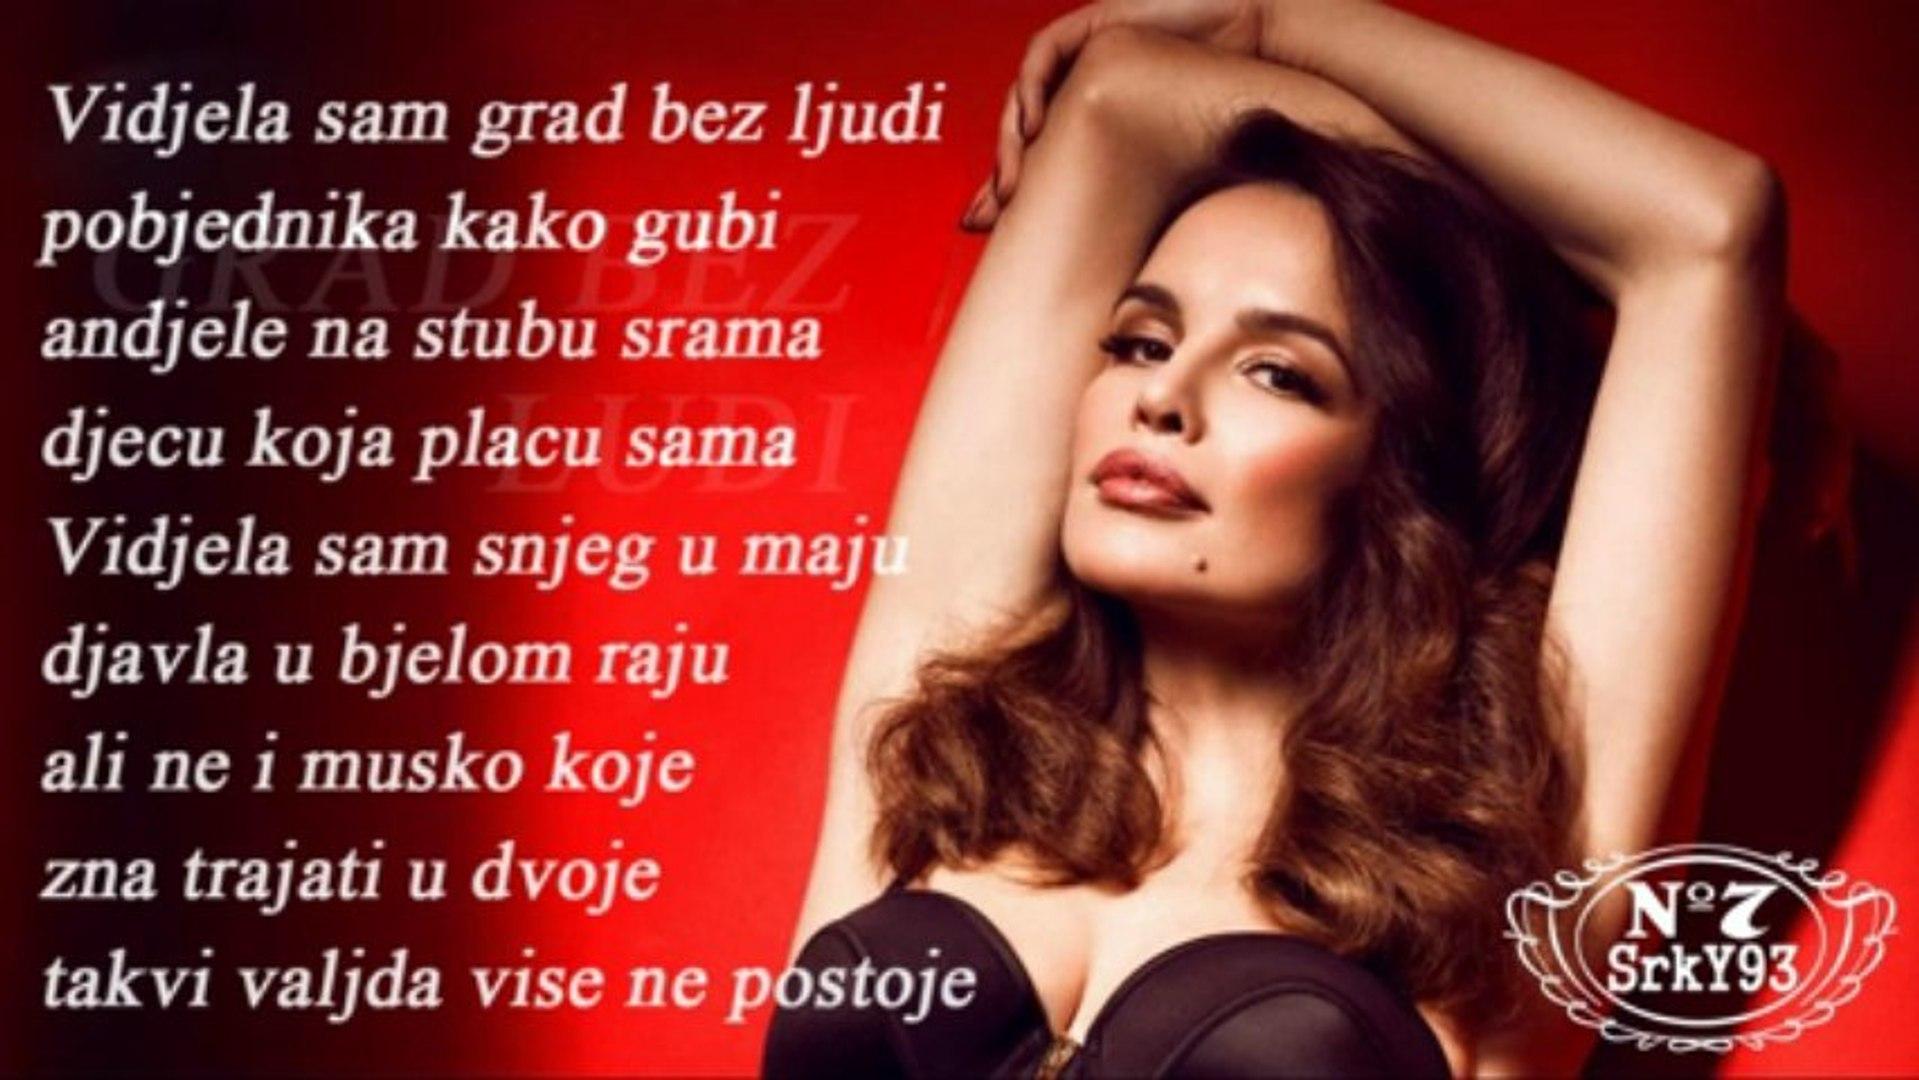 Severina - 2013 - 08 - Grad bez ljudi + Tekst